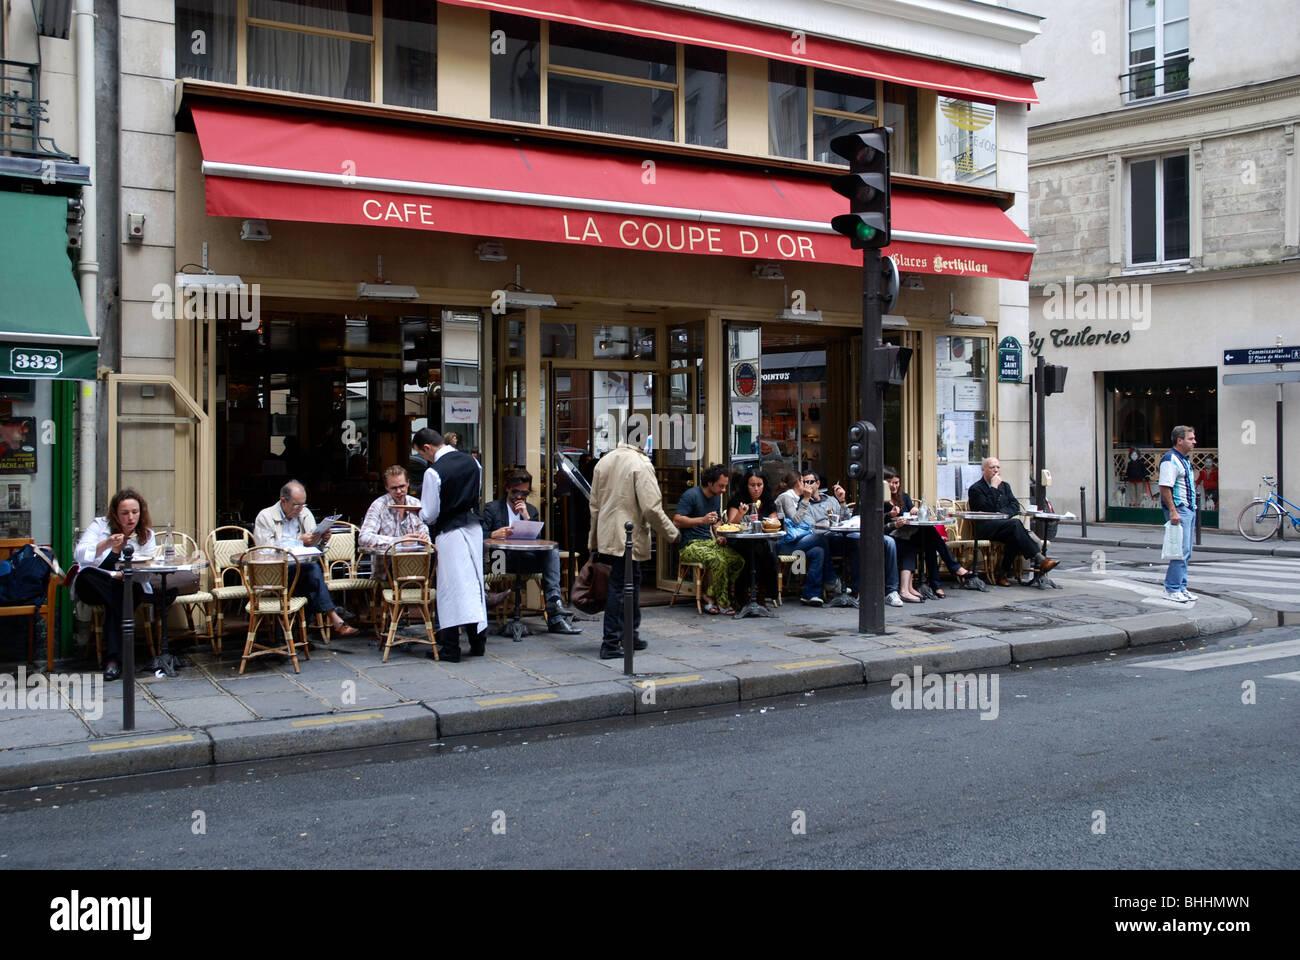 la coupe d 39 or in the rue saint honor paris stock photo. Black Bedroom Furniture Sets. Home Design Ideas